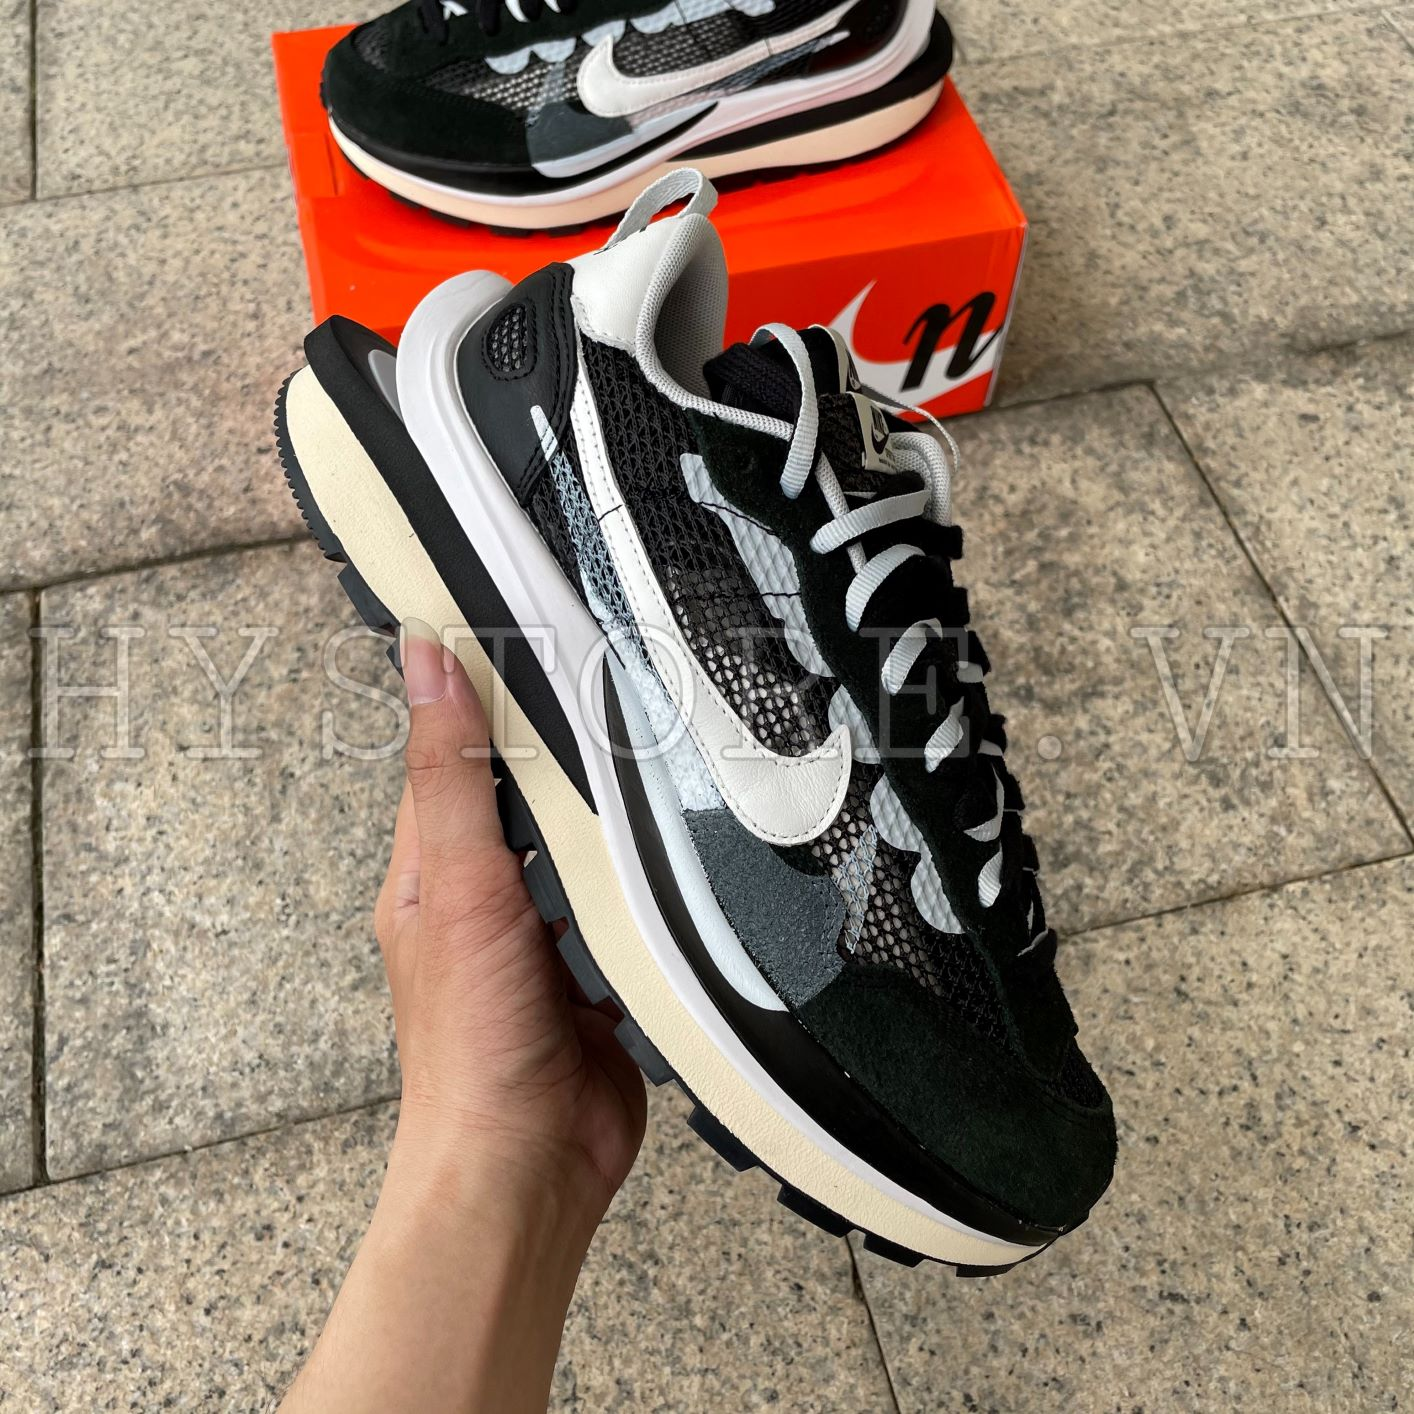 Giày Nike Sacai Vaporwaffle Black White